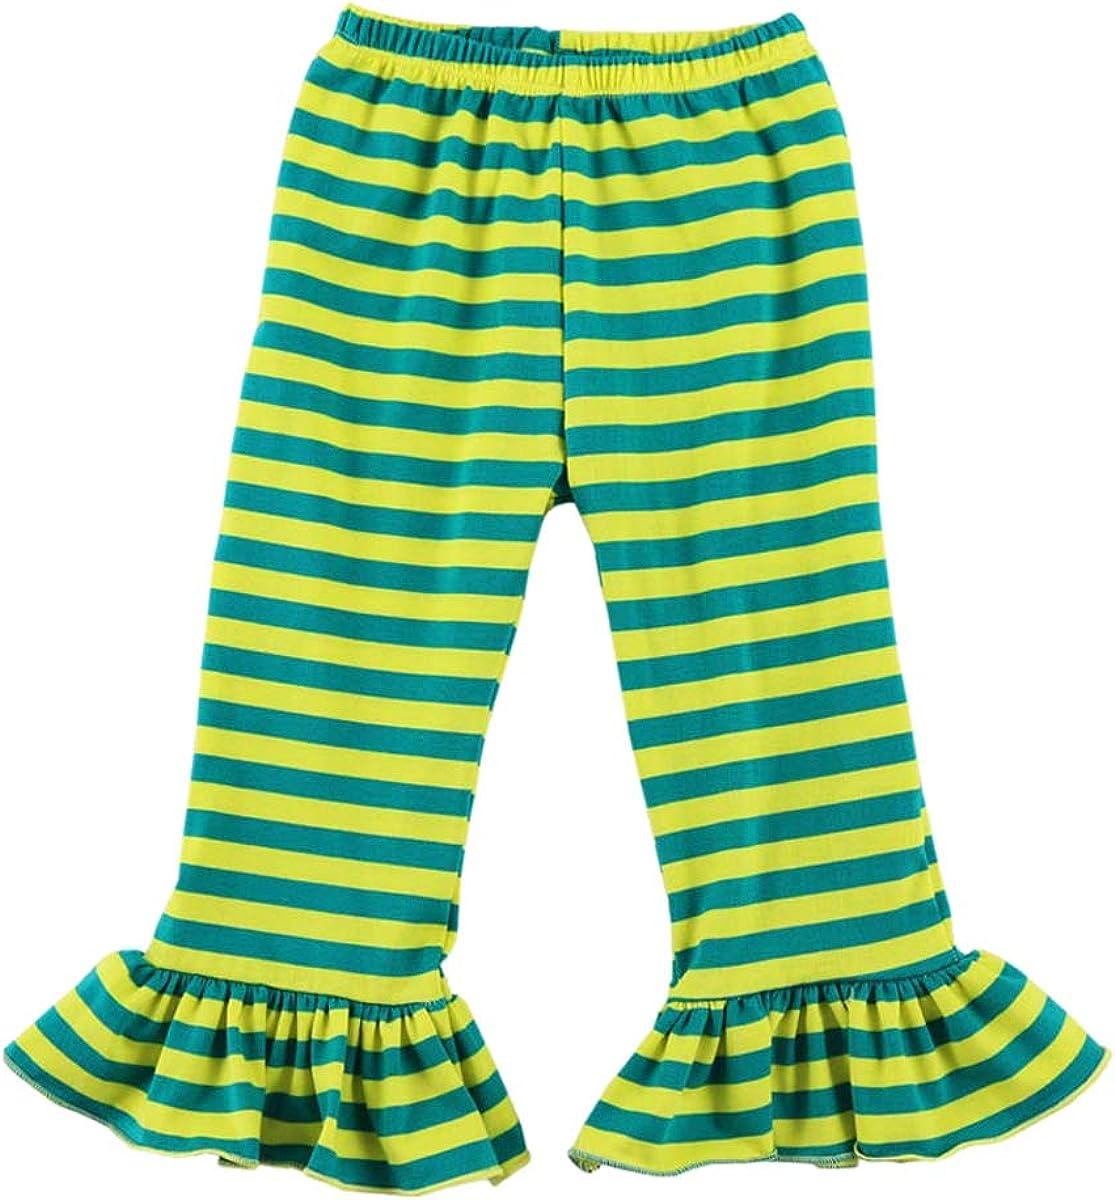 Wennikids Childrens Little Girls Ruffle Soft Cotton Flare Pants